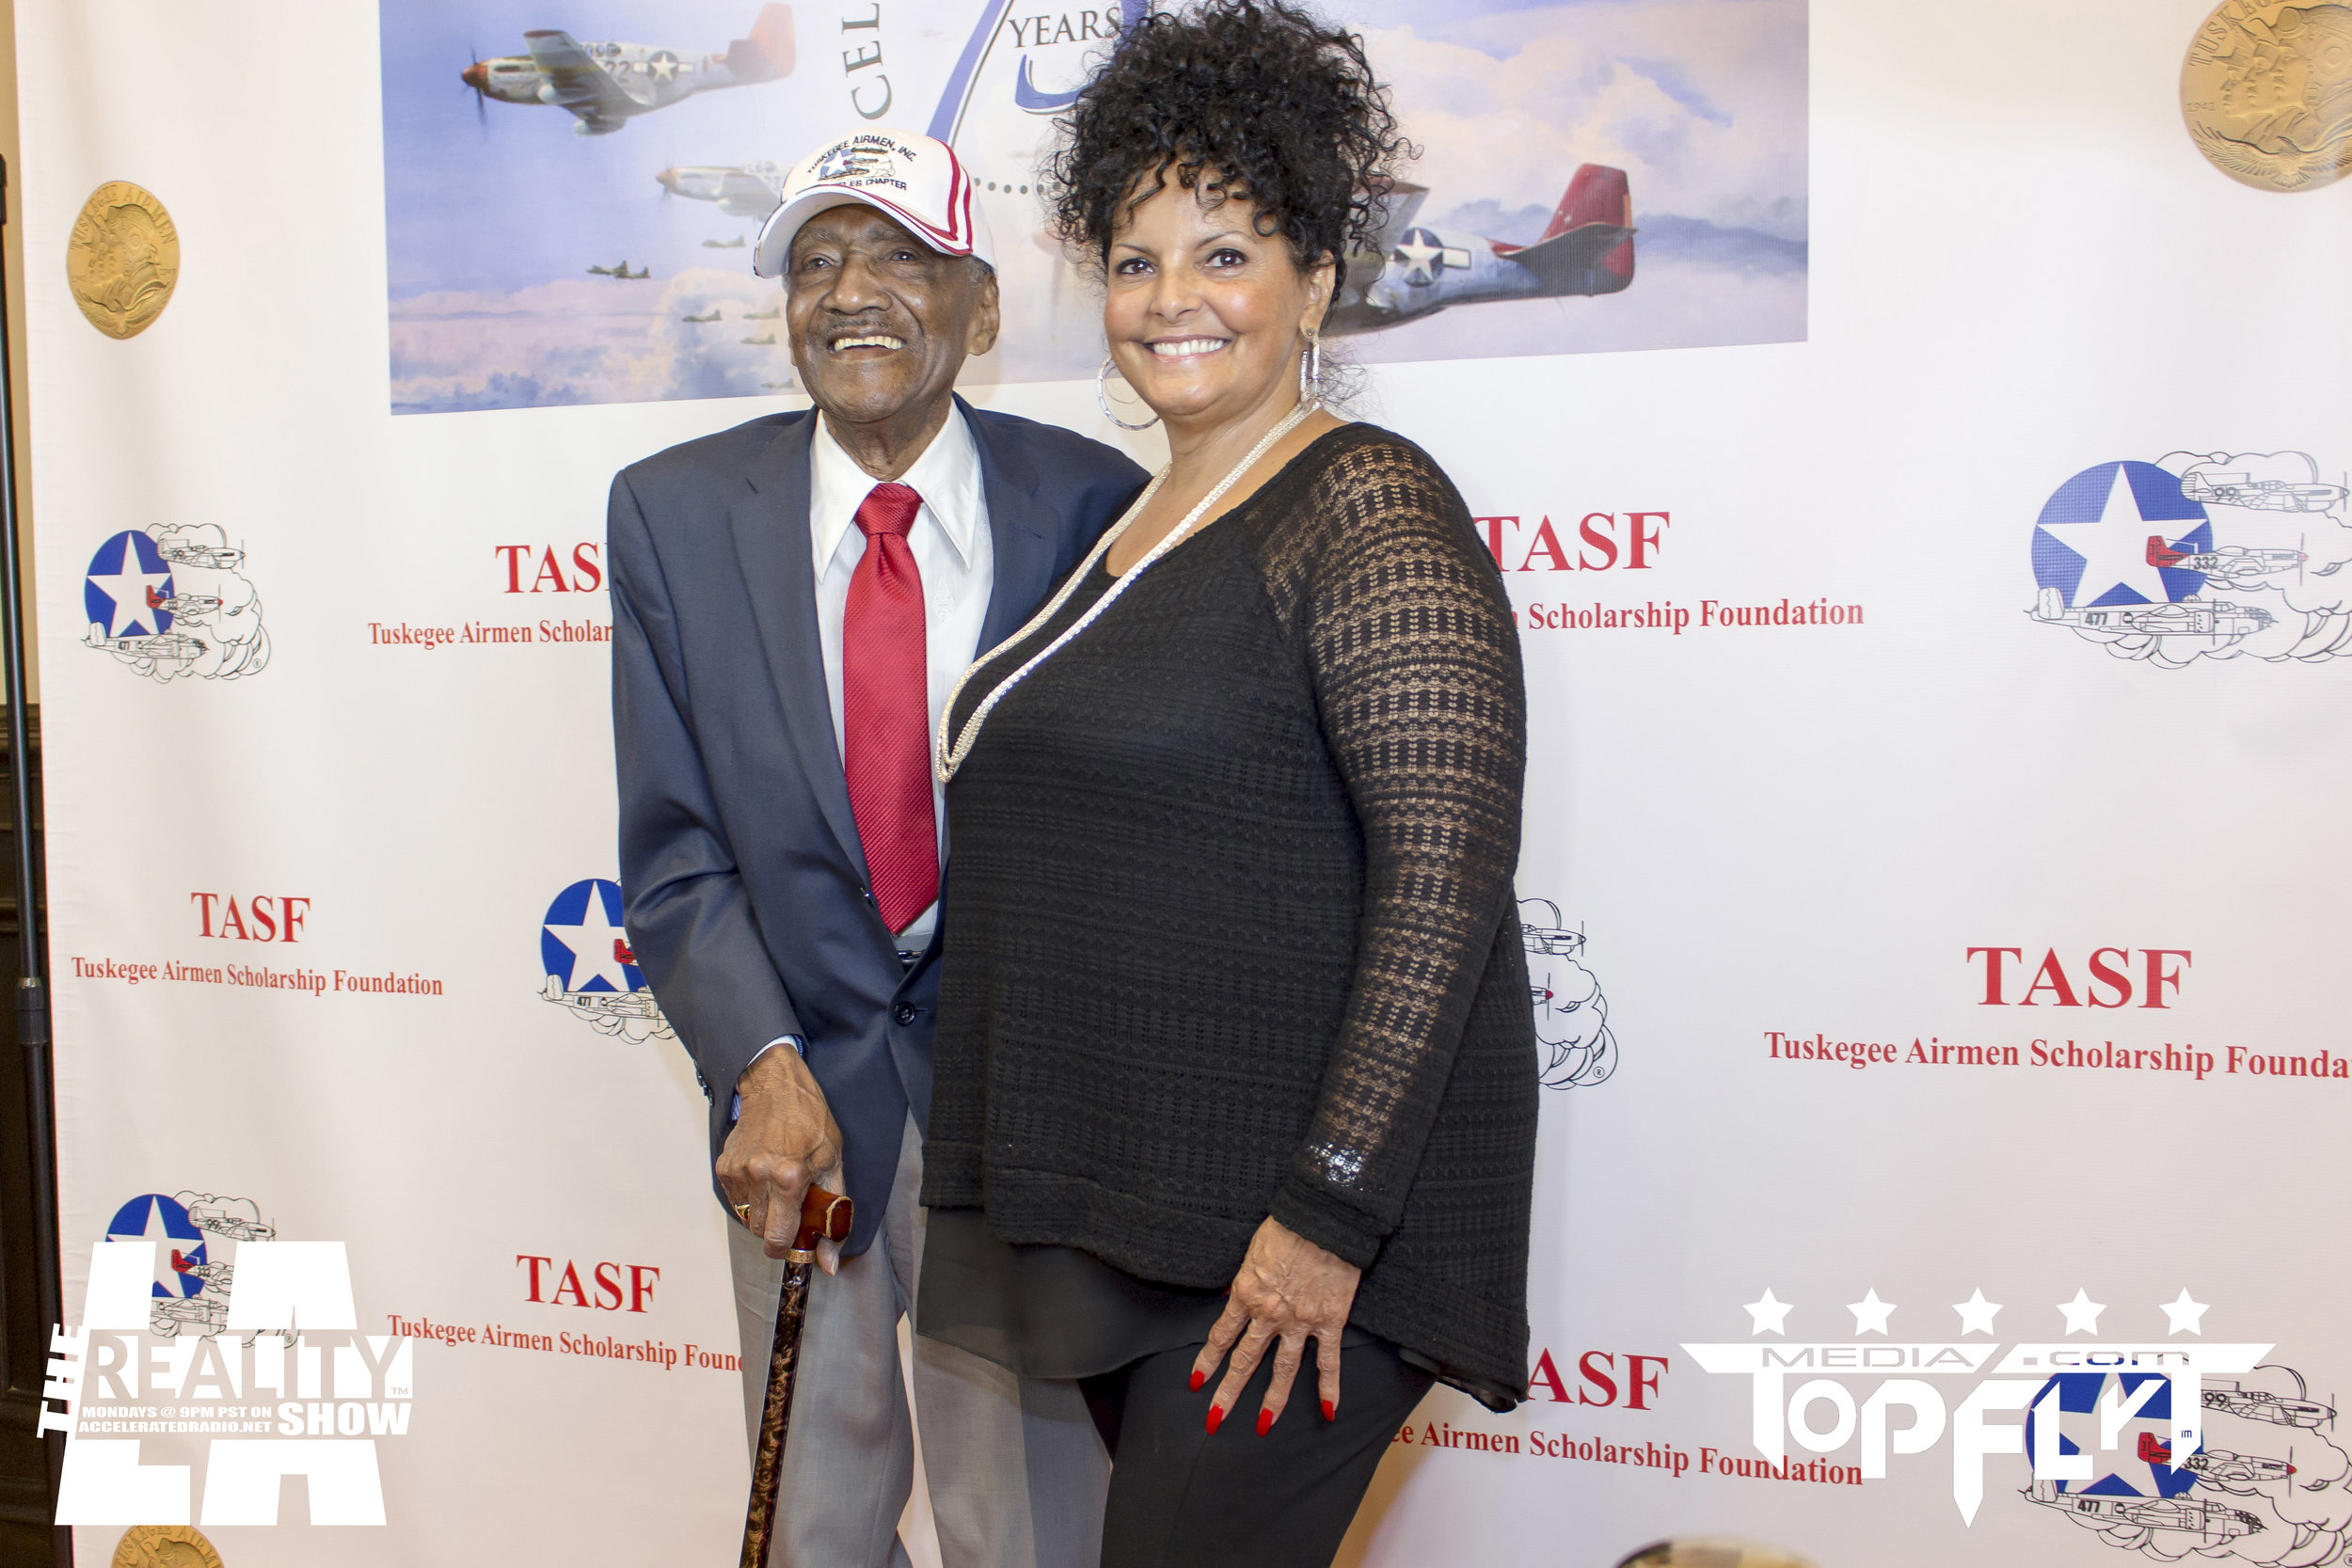 The Reality Show LA - Tuskegee Airmen 75th Anniversary VIP Reception_13.jpg